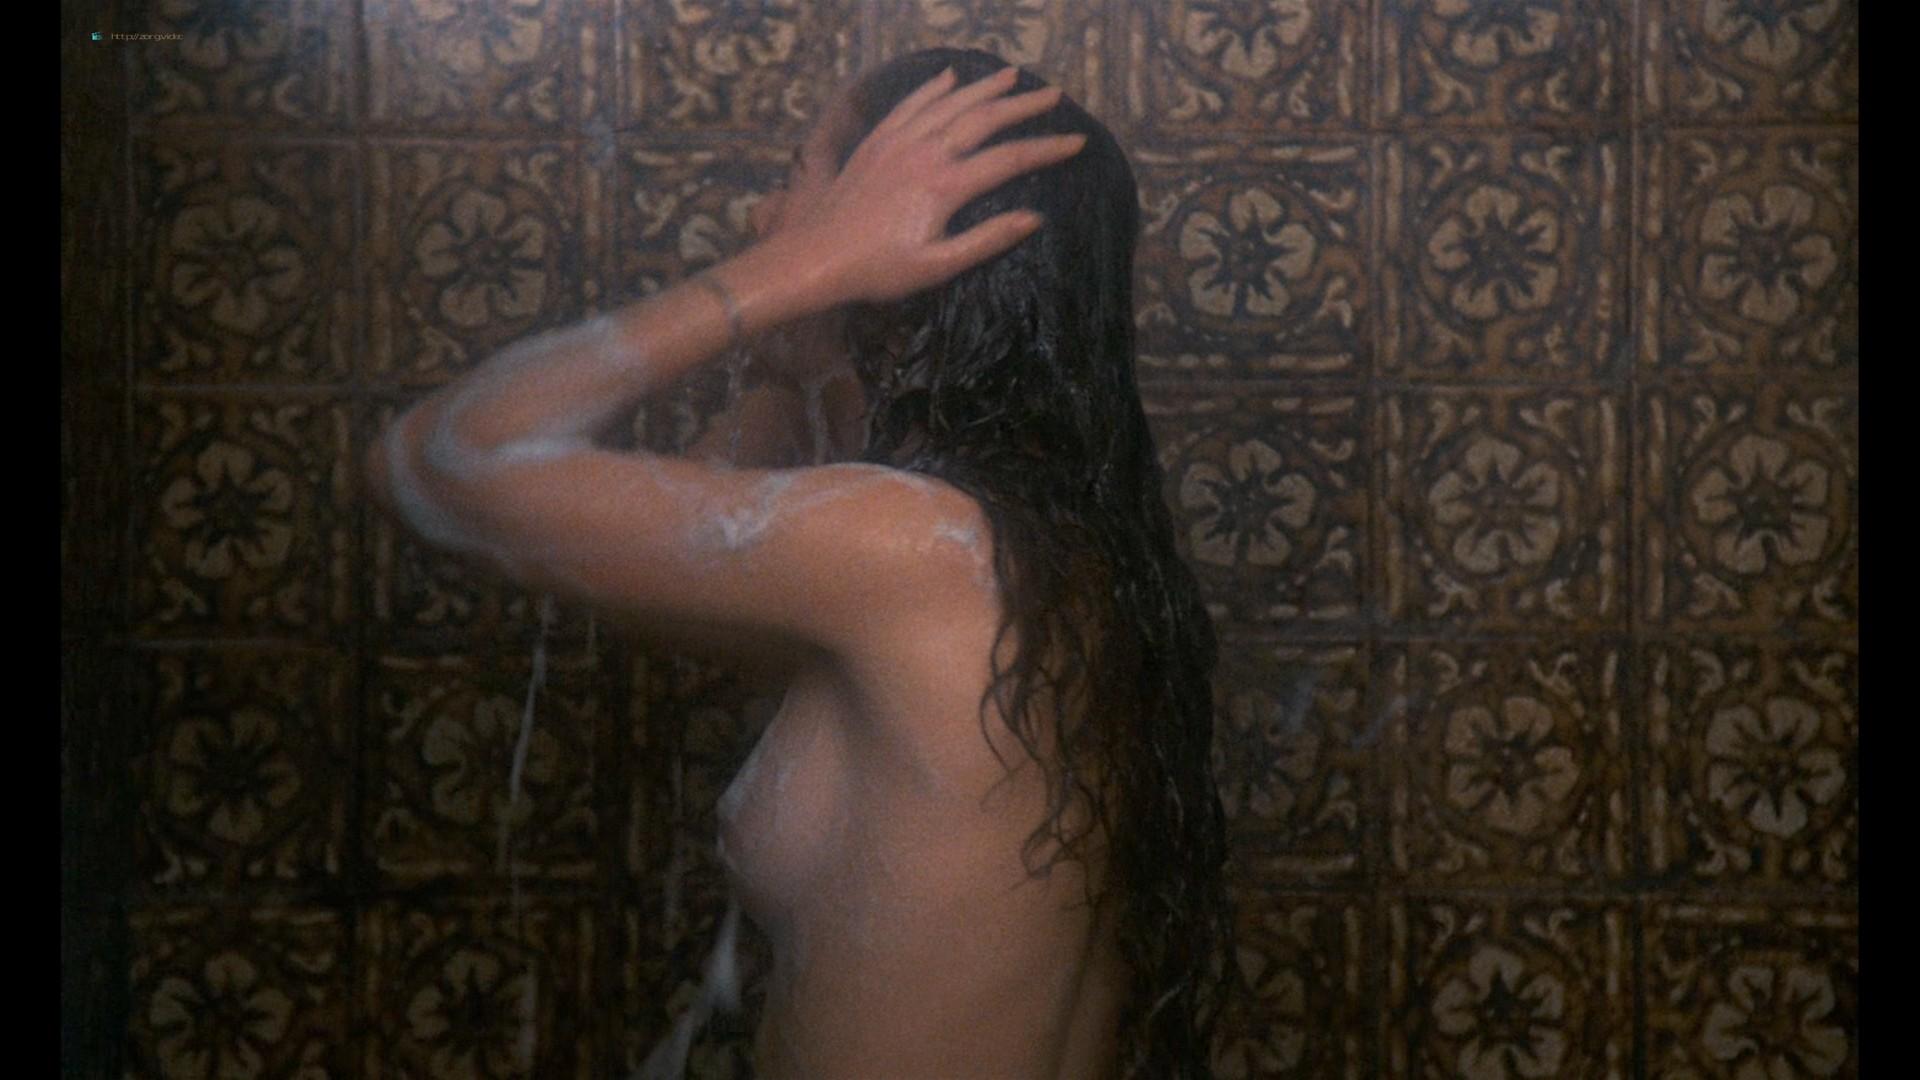 Roxana Nieto nude Leticia Marfil and Pilar Alcón all nude bush topless - Pieces (1982) HD 1080p BluRay (8)